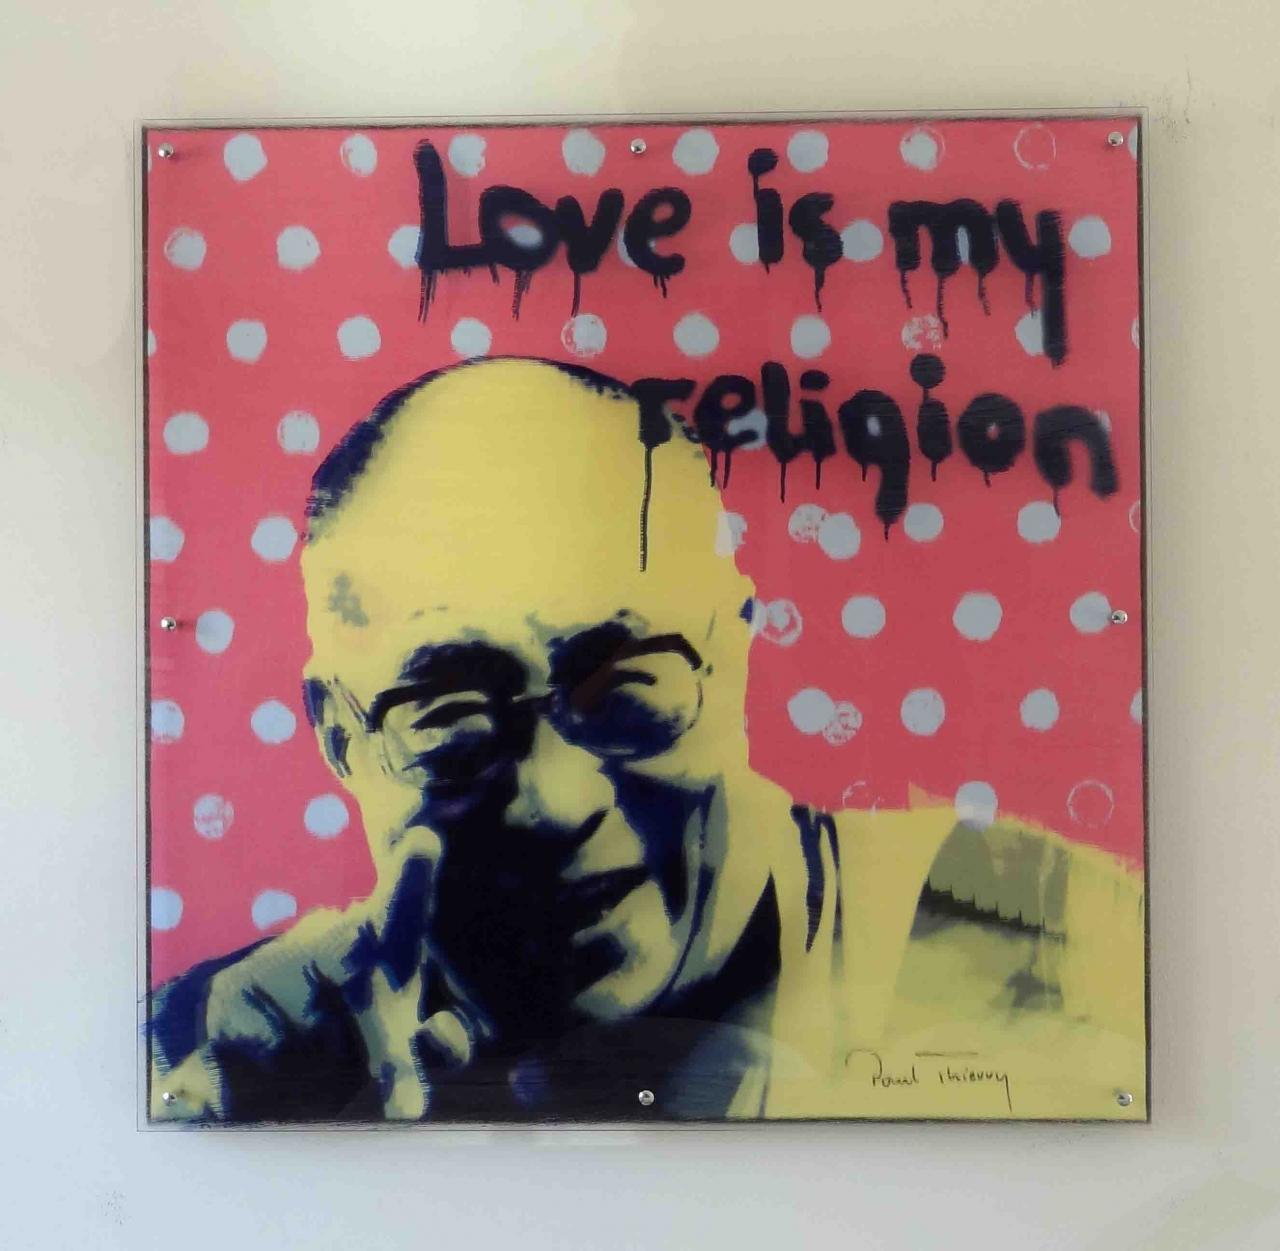 Dalai Lama - Love is my religion